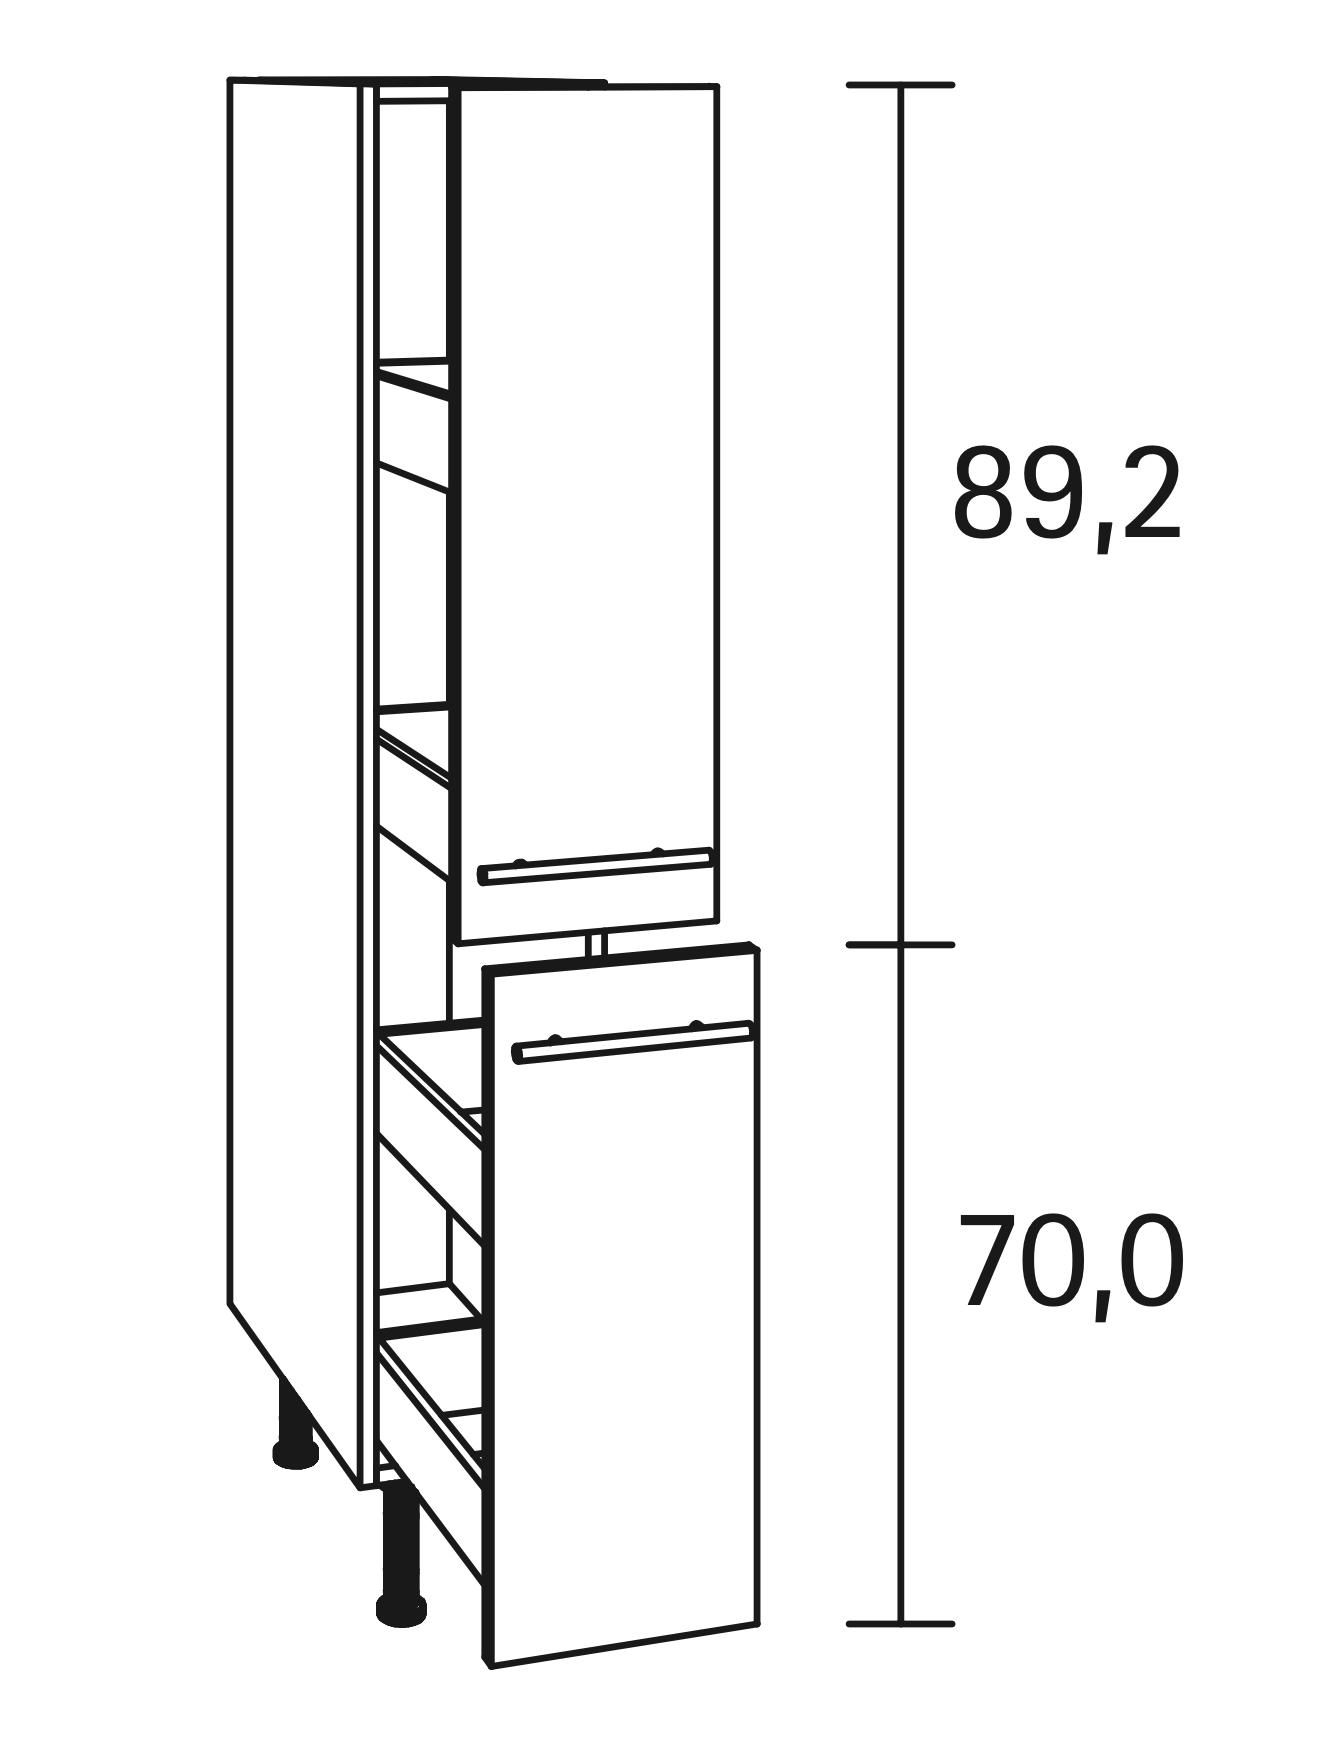 MHFZ306-8E